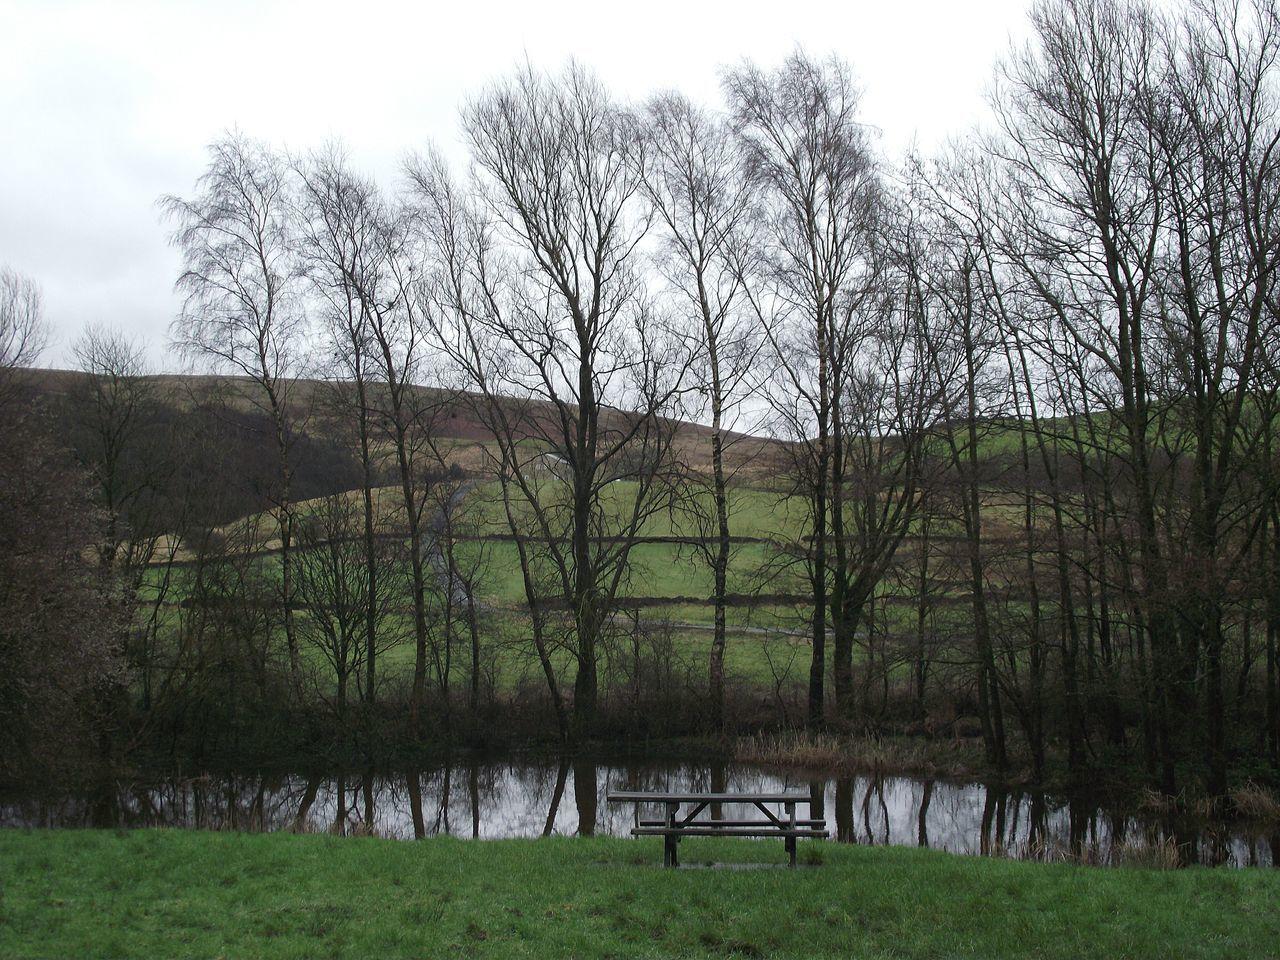 Hollingworth Lake EyeEm Best Shots - Nature EyeEm Best Shots Trees And Sky Trees And Water